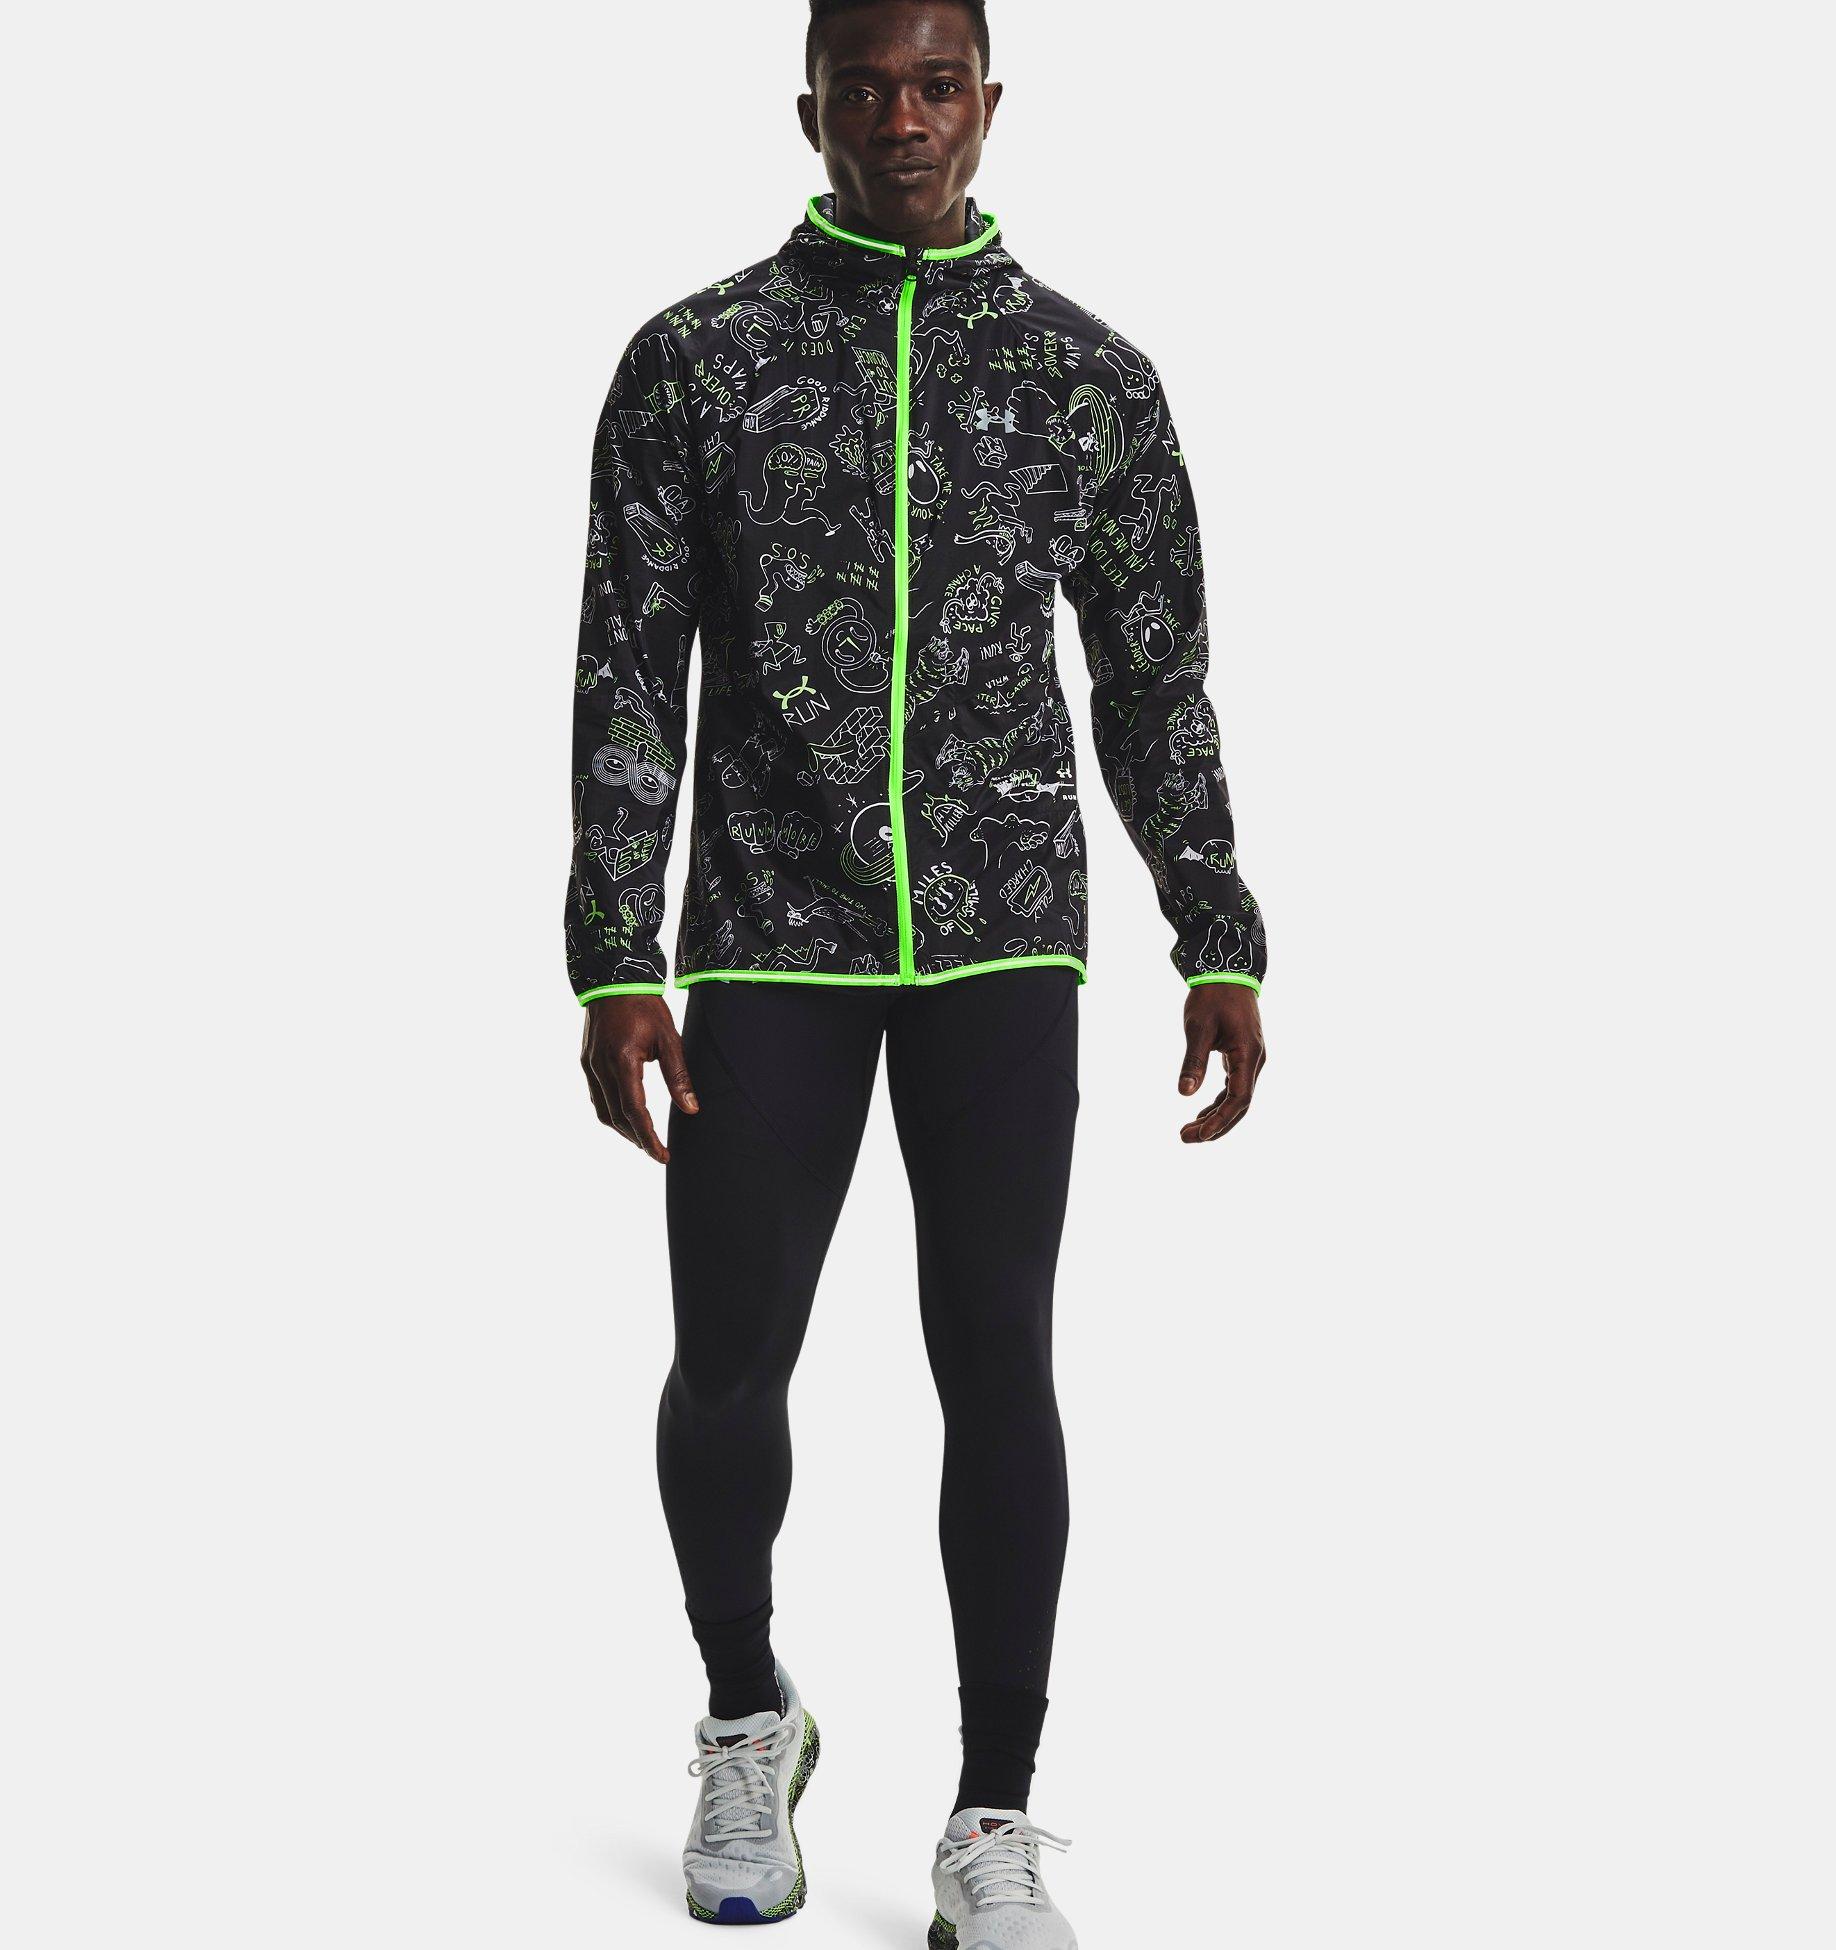 Underarmour Mens UA Run Hundred Packable Jacket